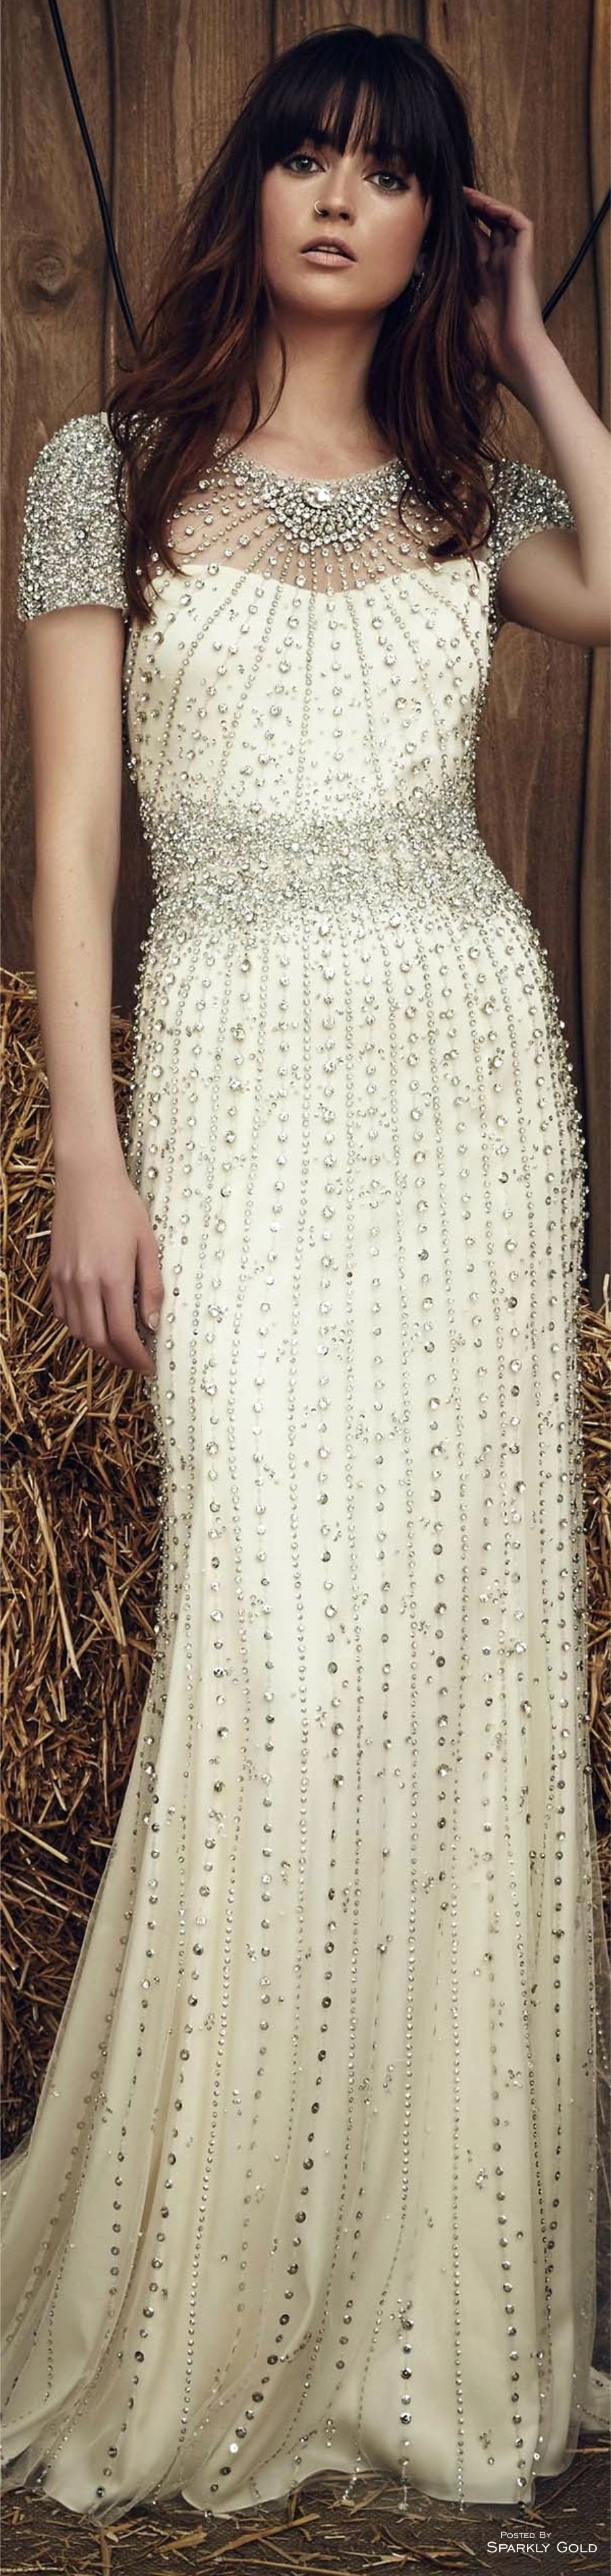 Antique Wedding Dresses For Sale | Jenny packham, Spring and Wedding ...